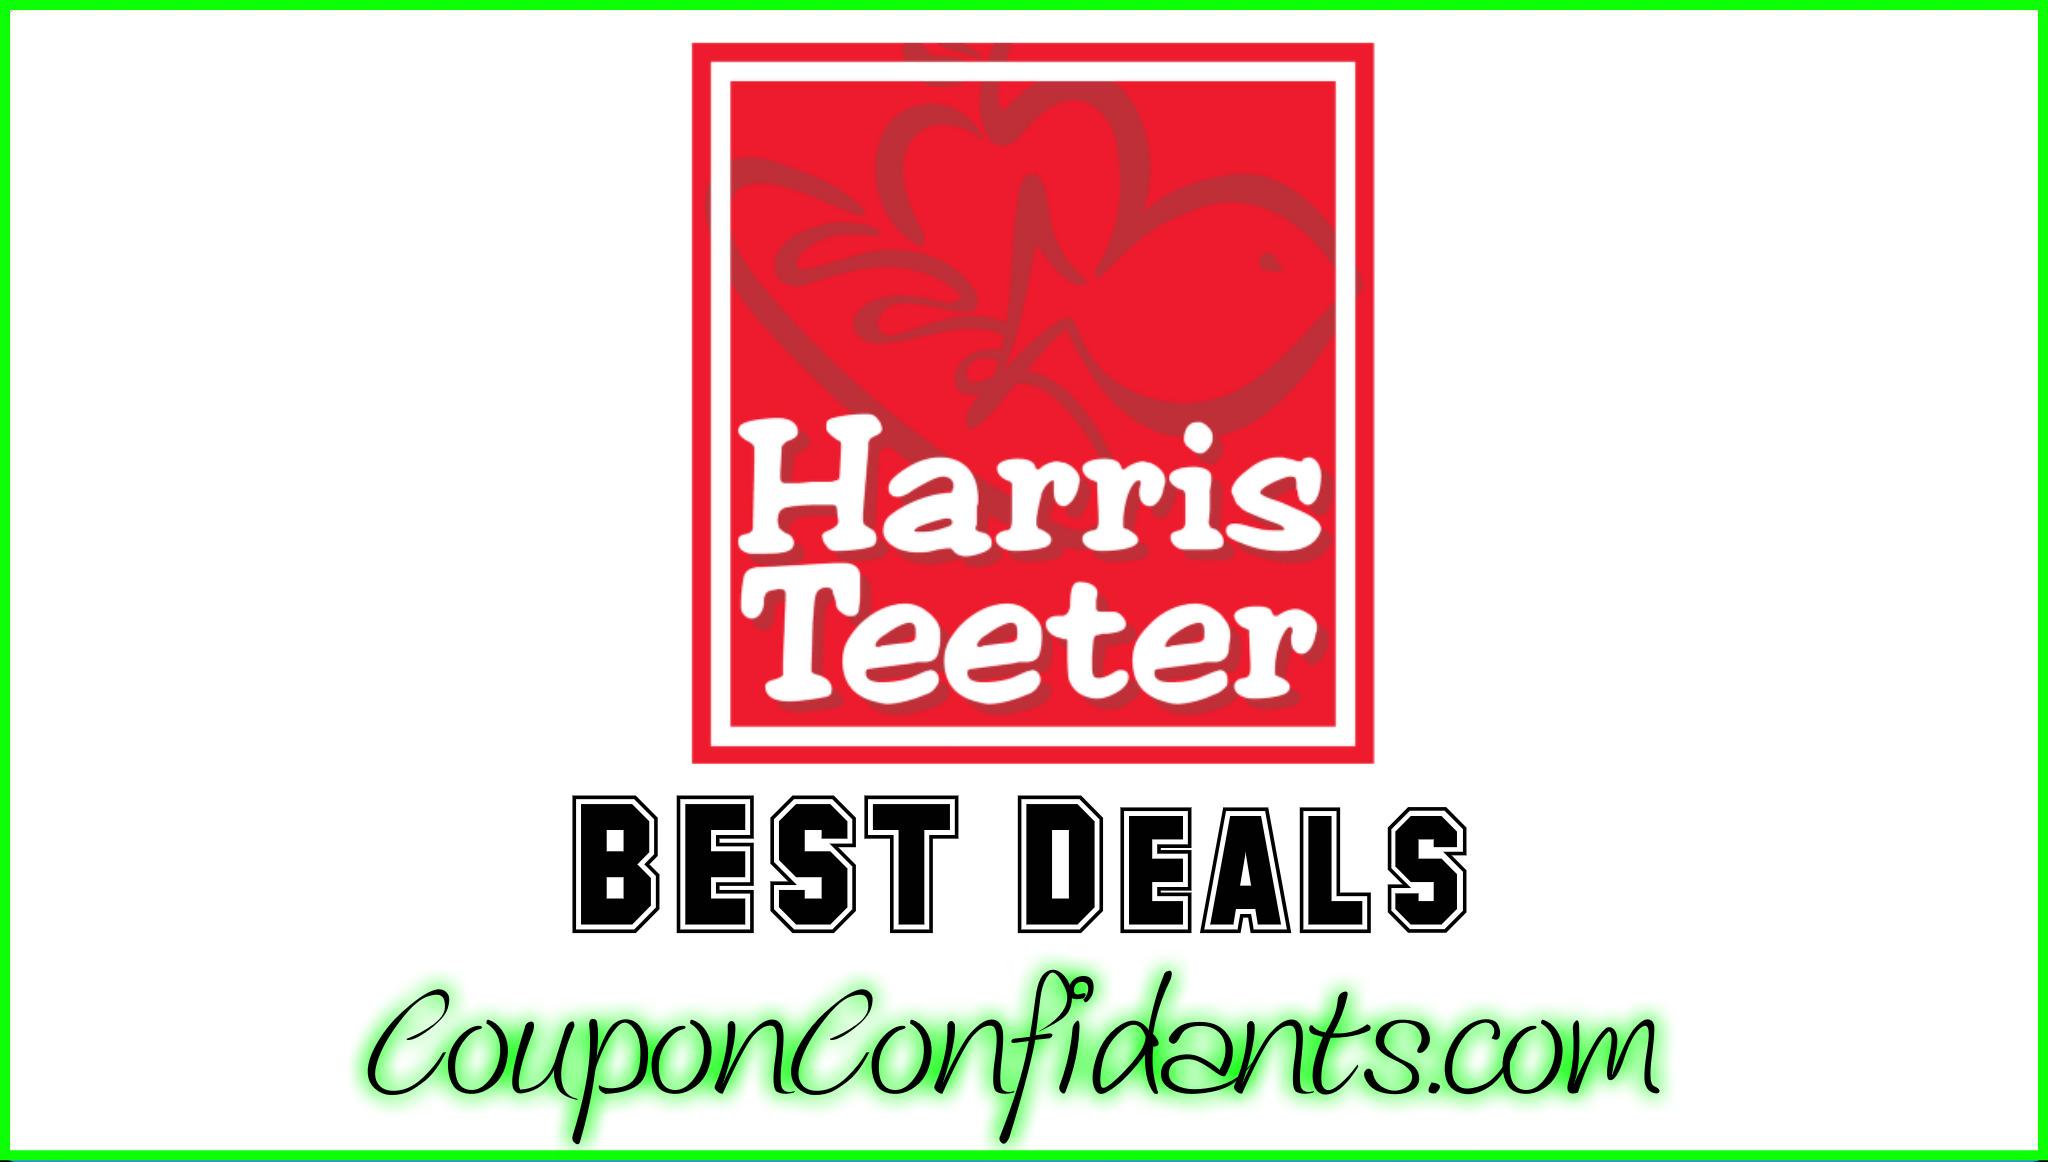 Harris Teeter - March 21 - March 27